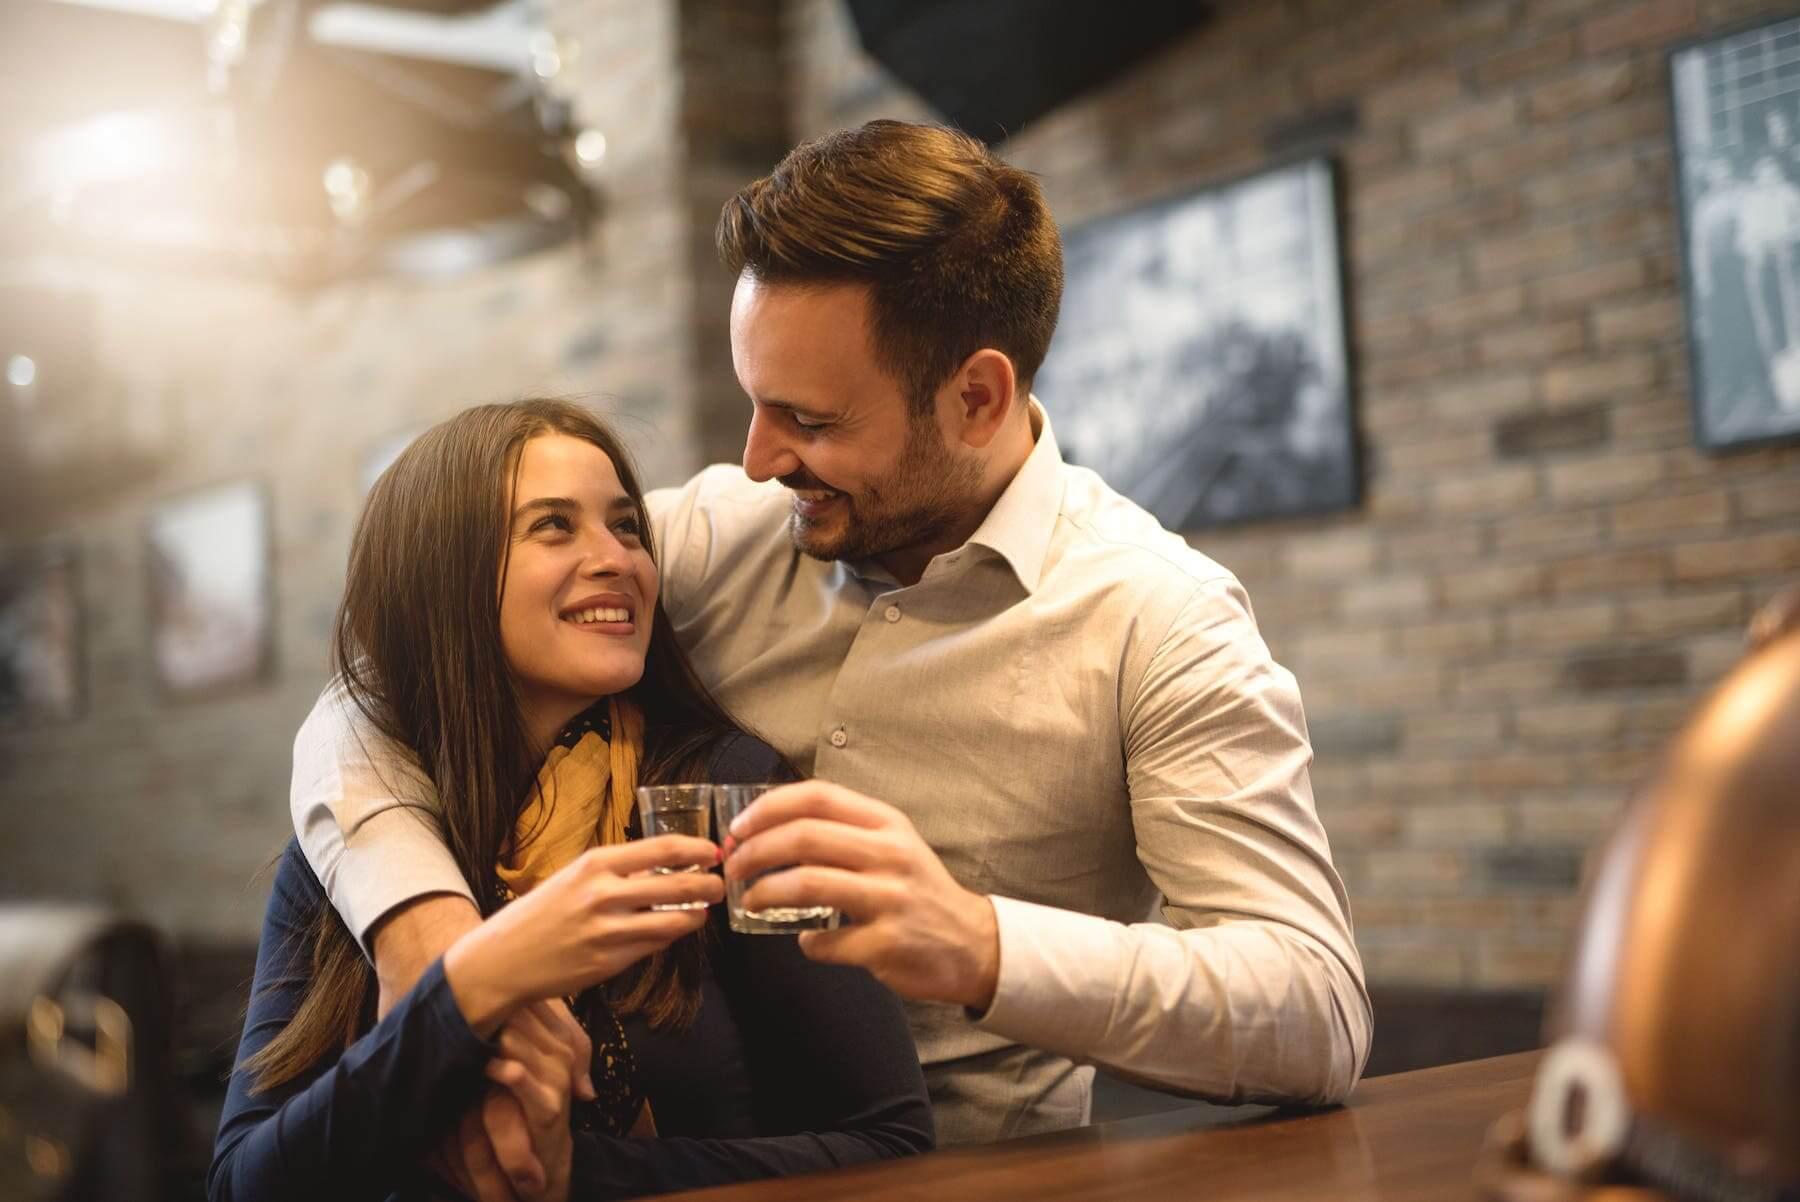 Merkmale des Dating-Partners